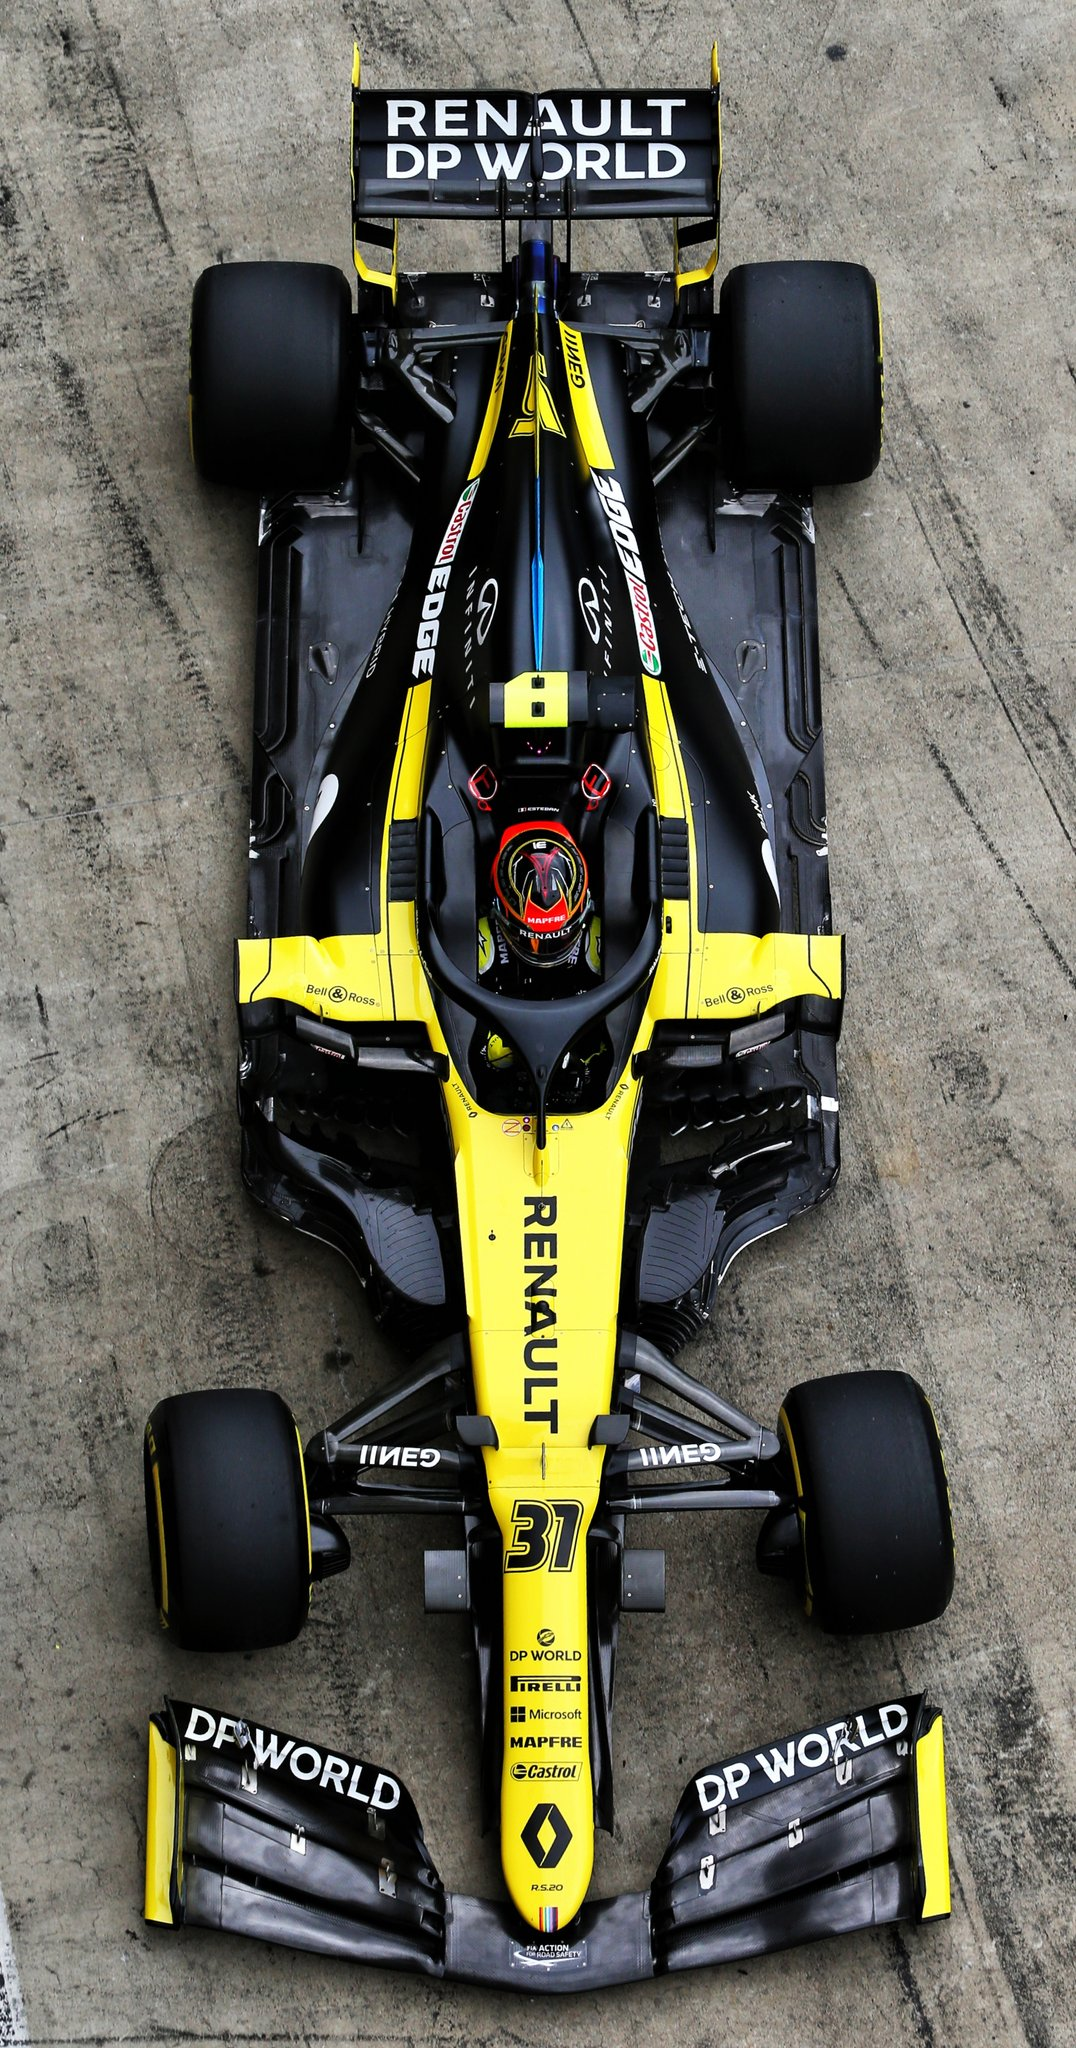 [F1] Renault Sport  - Page 7 EcAPbZ7WoAM1hWH?format=jpg&name=large